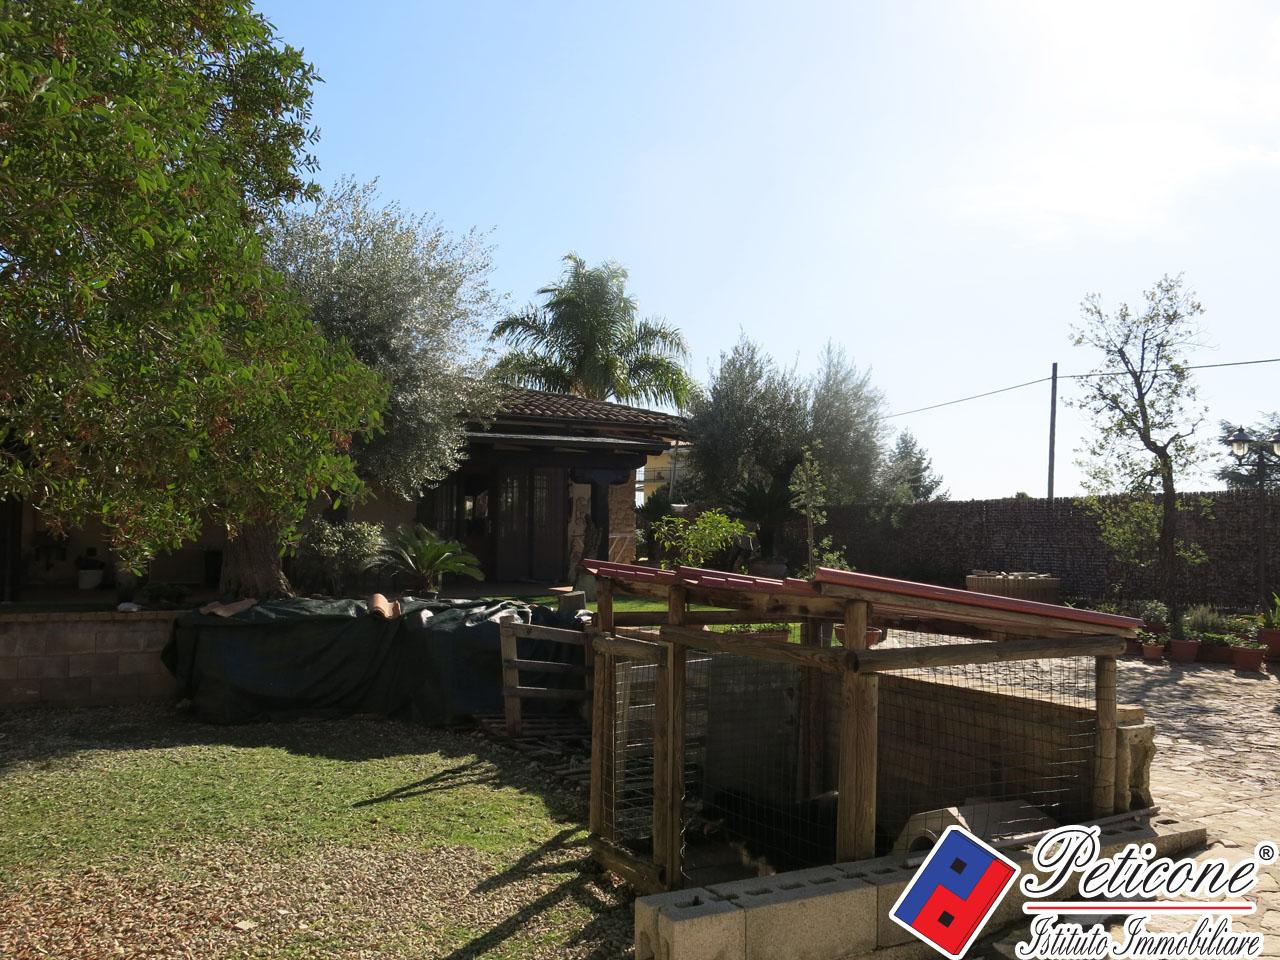 Villa in Vendita a Fondi: 3 locali, 107 mq - Foto 23